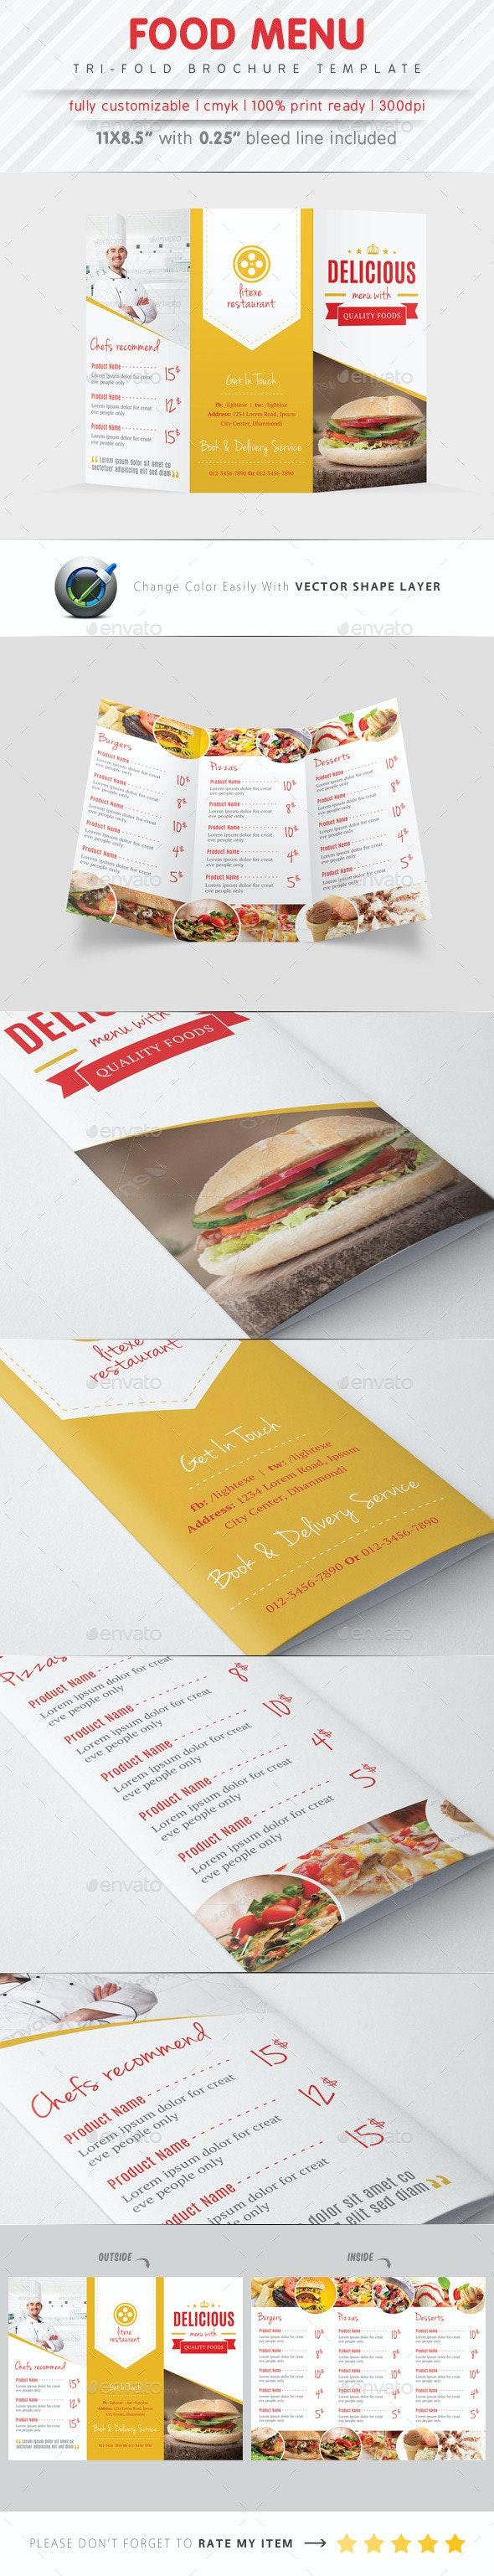 Food Menu Tri Fold Brochure - Food Menus Print Templates